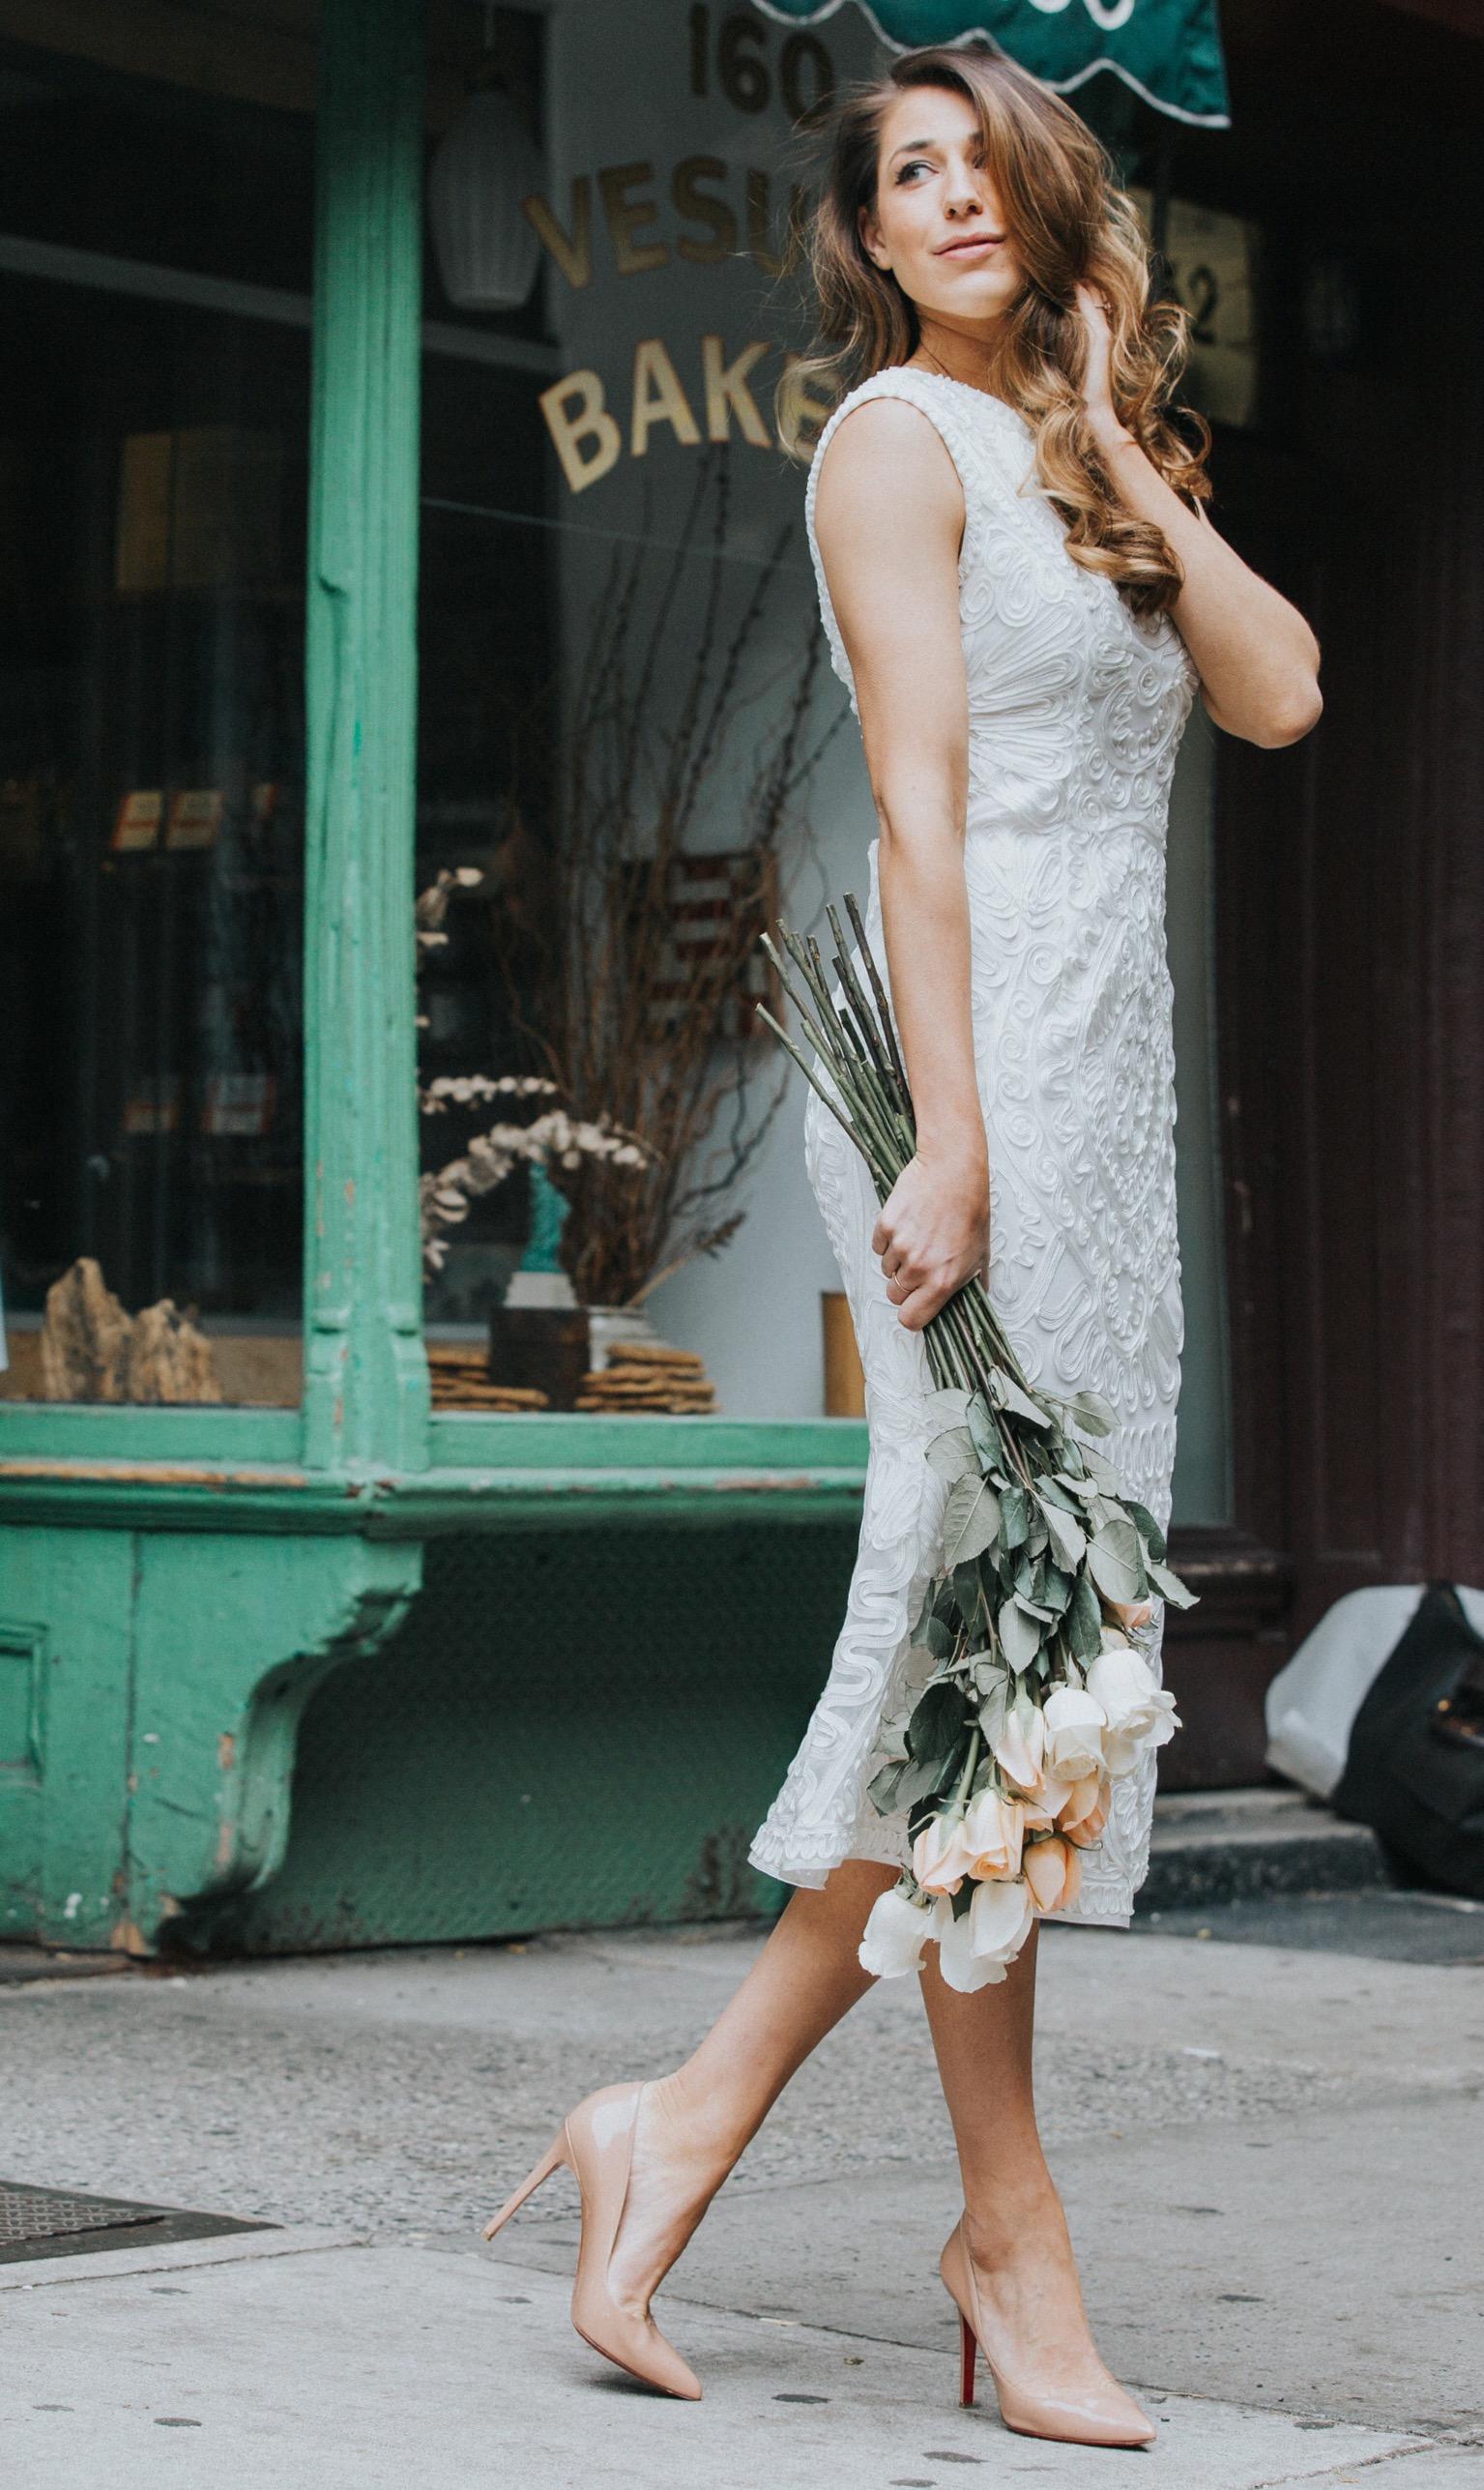 Andrea from A Slice O Pi calls this ribbon-embellished midi dress the perfect bridal shower dress. See more on the David's Bridal blog - www.davidsbridal.com/blog.